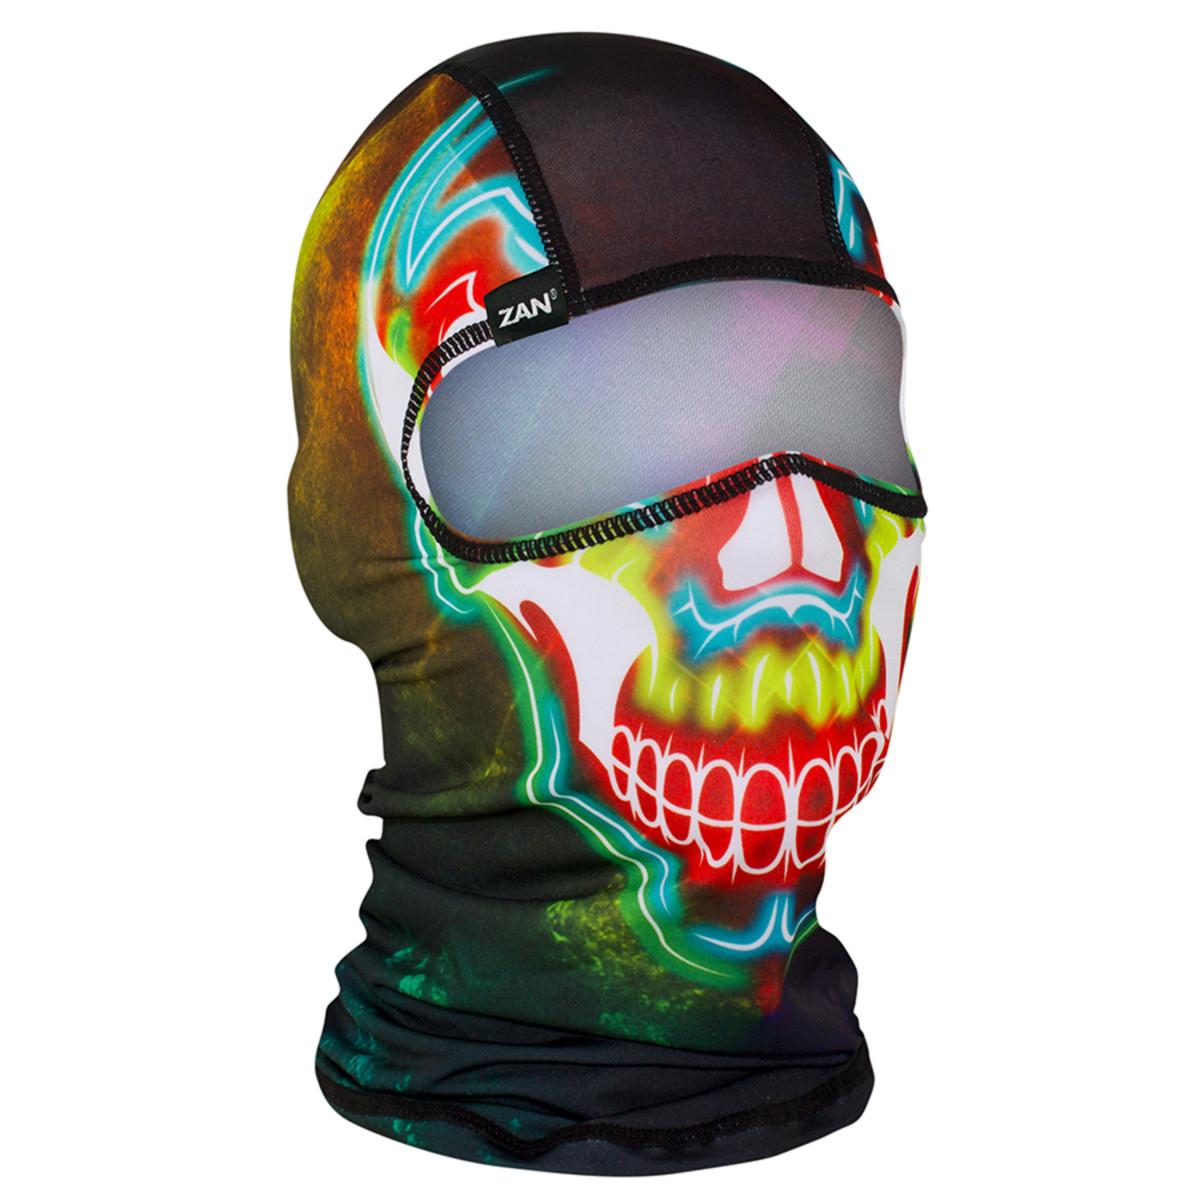 ZAN Polyester Balaclava Electric Skull